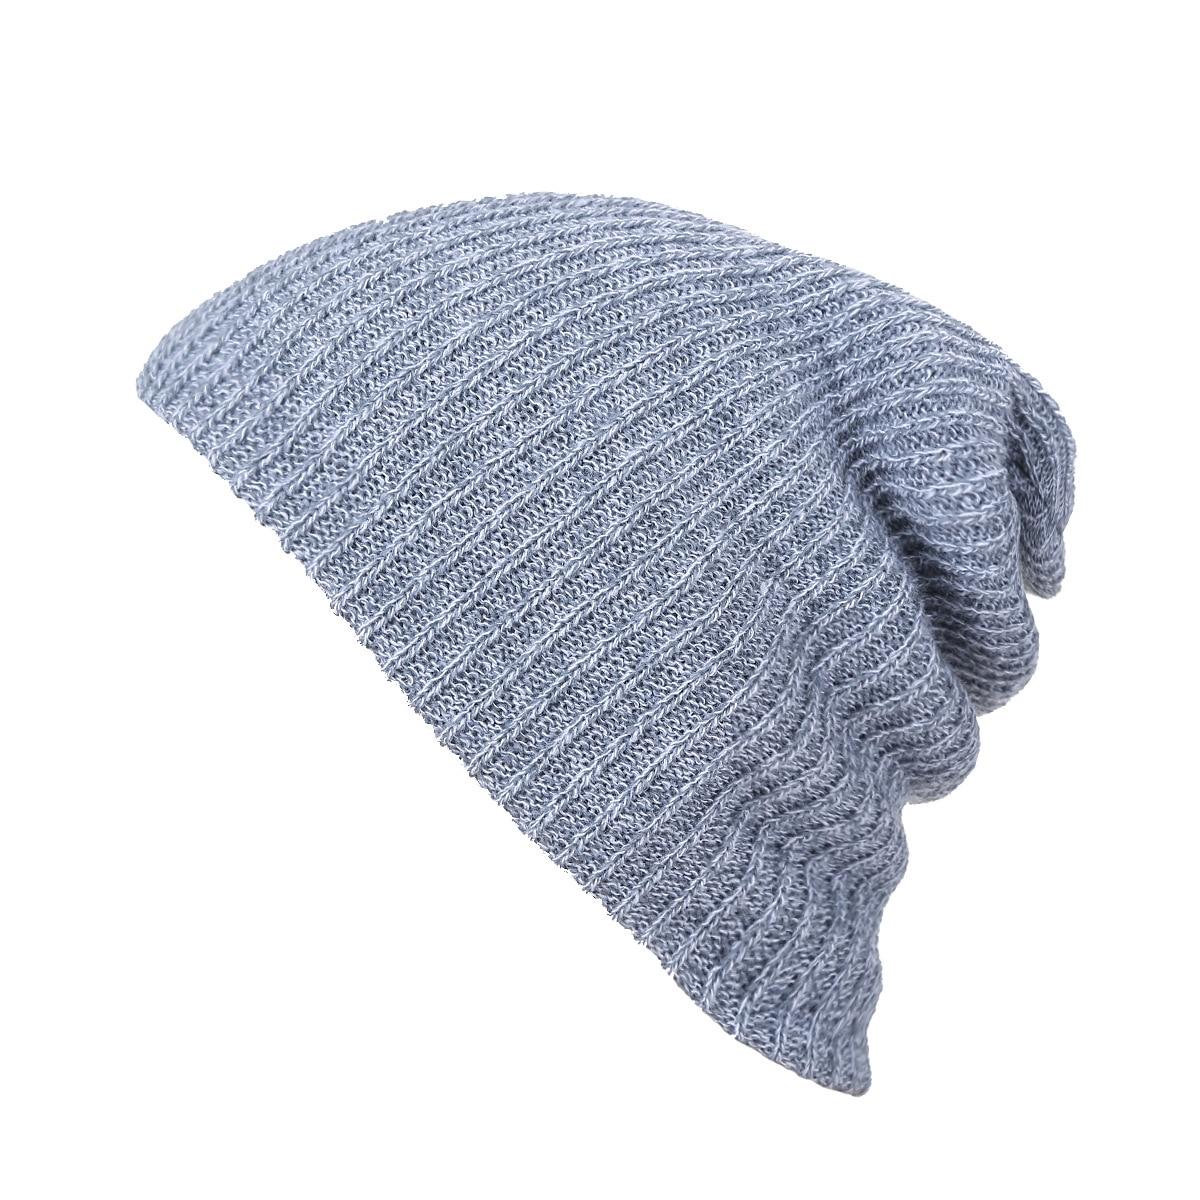 COKK Χειμερινά Καπέλα για Άντρες - Αξεσουάρ ένδυσης - Φωτογραφία 4